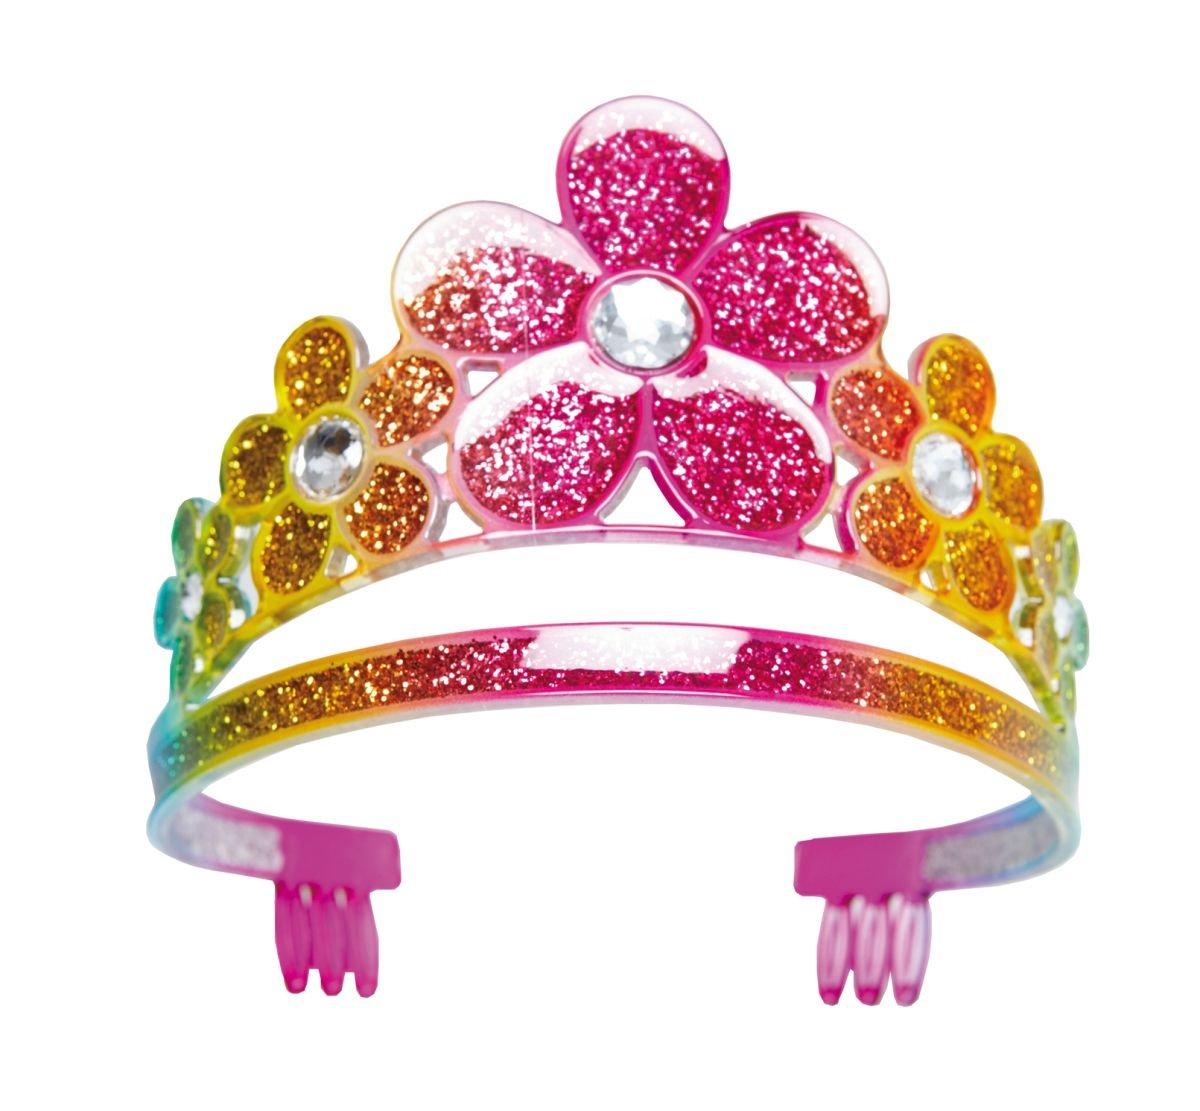 Blumendiadem bunt Diadem Blume Prinzessinenkrone Prinzessin